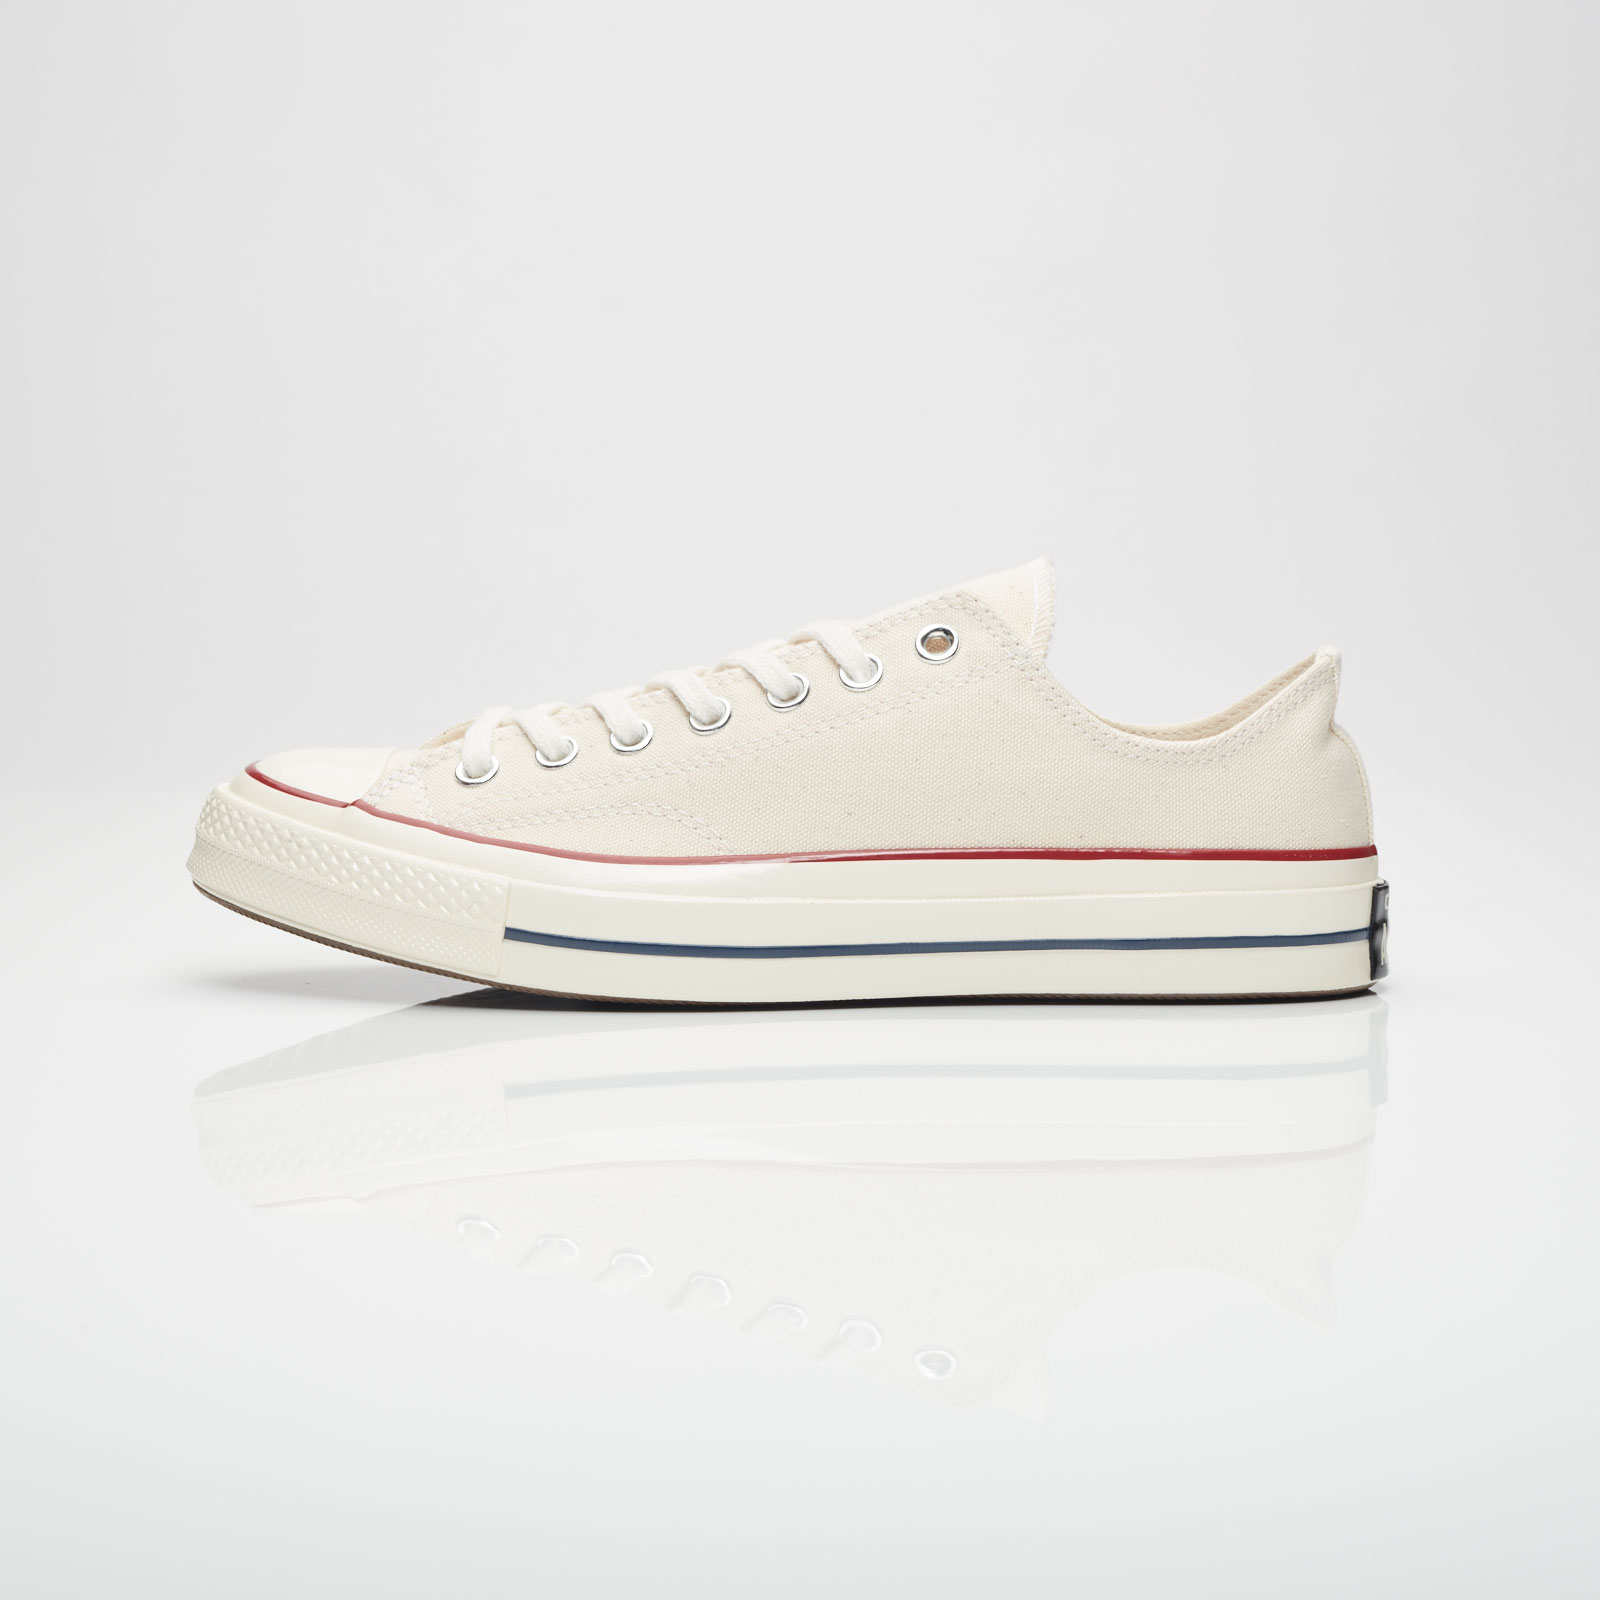 Converse Chuck Taylor 70 Ox 142338c Sneakersnstuff